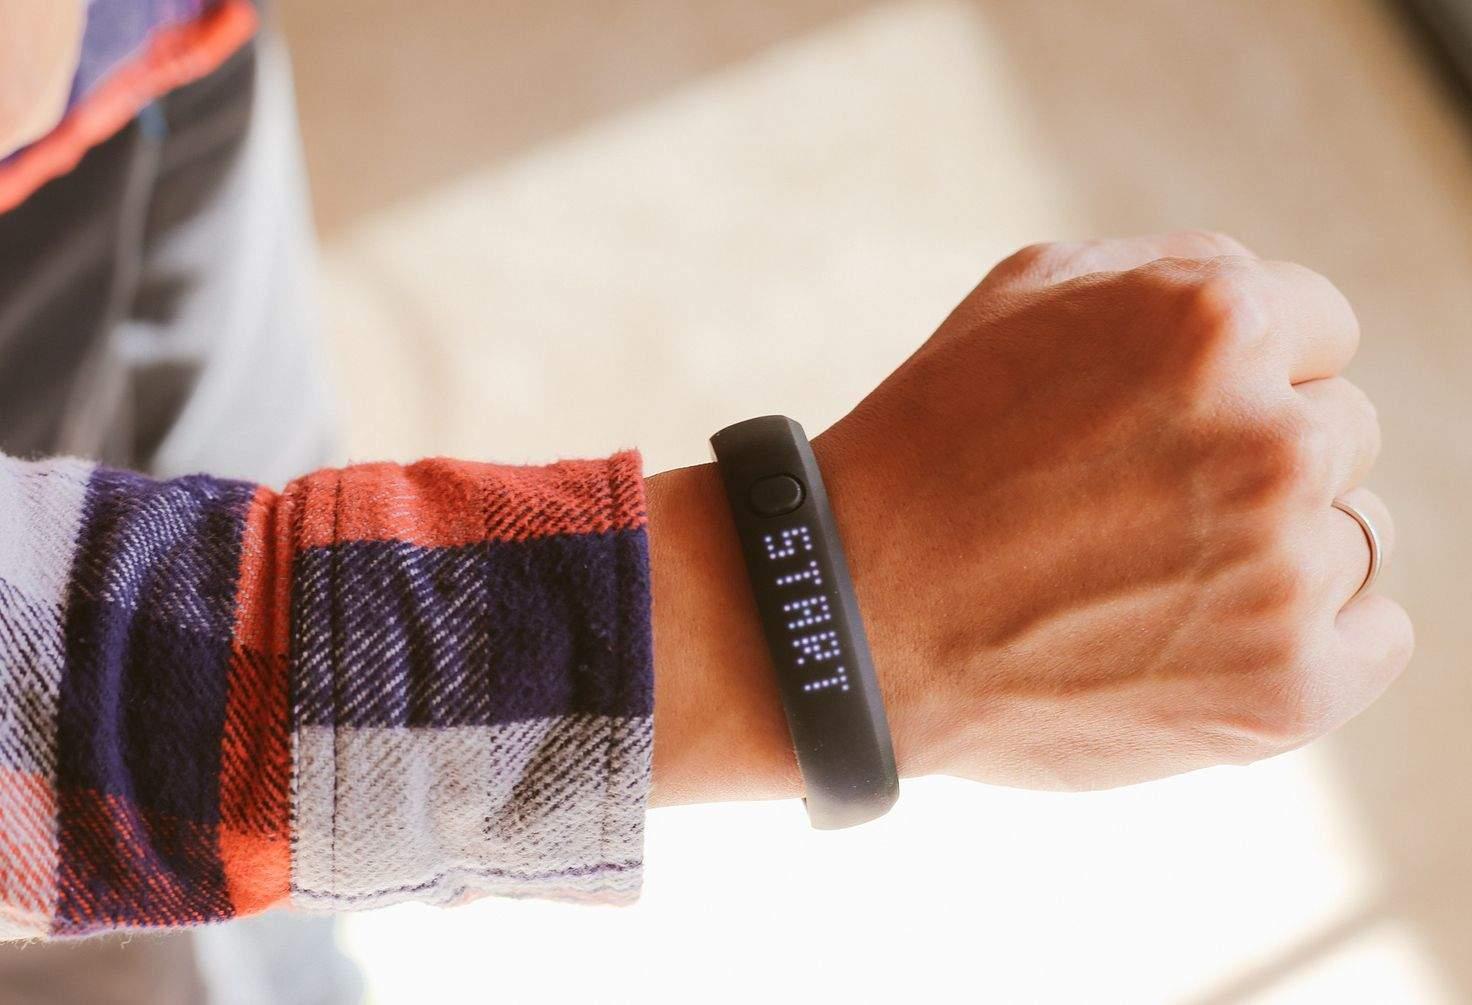 Microsoft's 11-sensor smartwatch will take on the iWatch ...